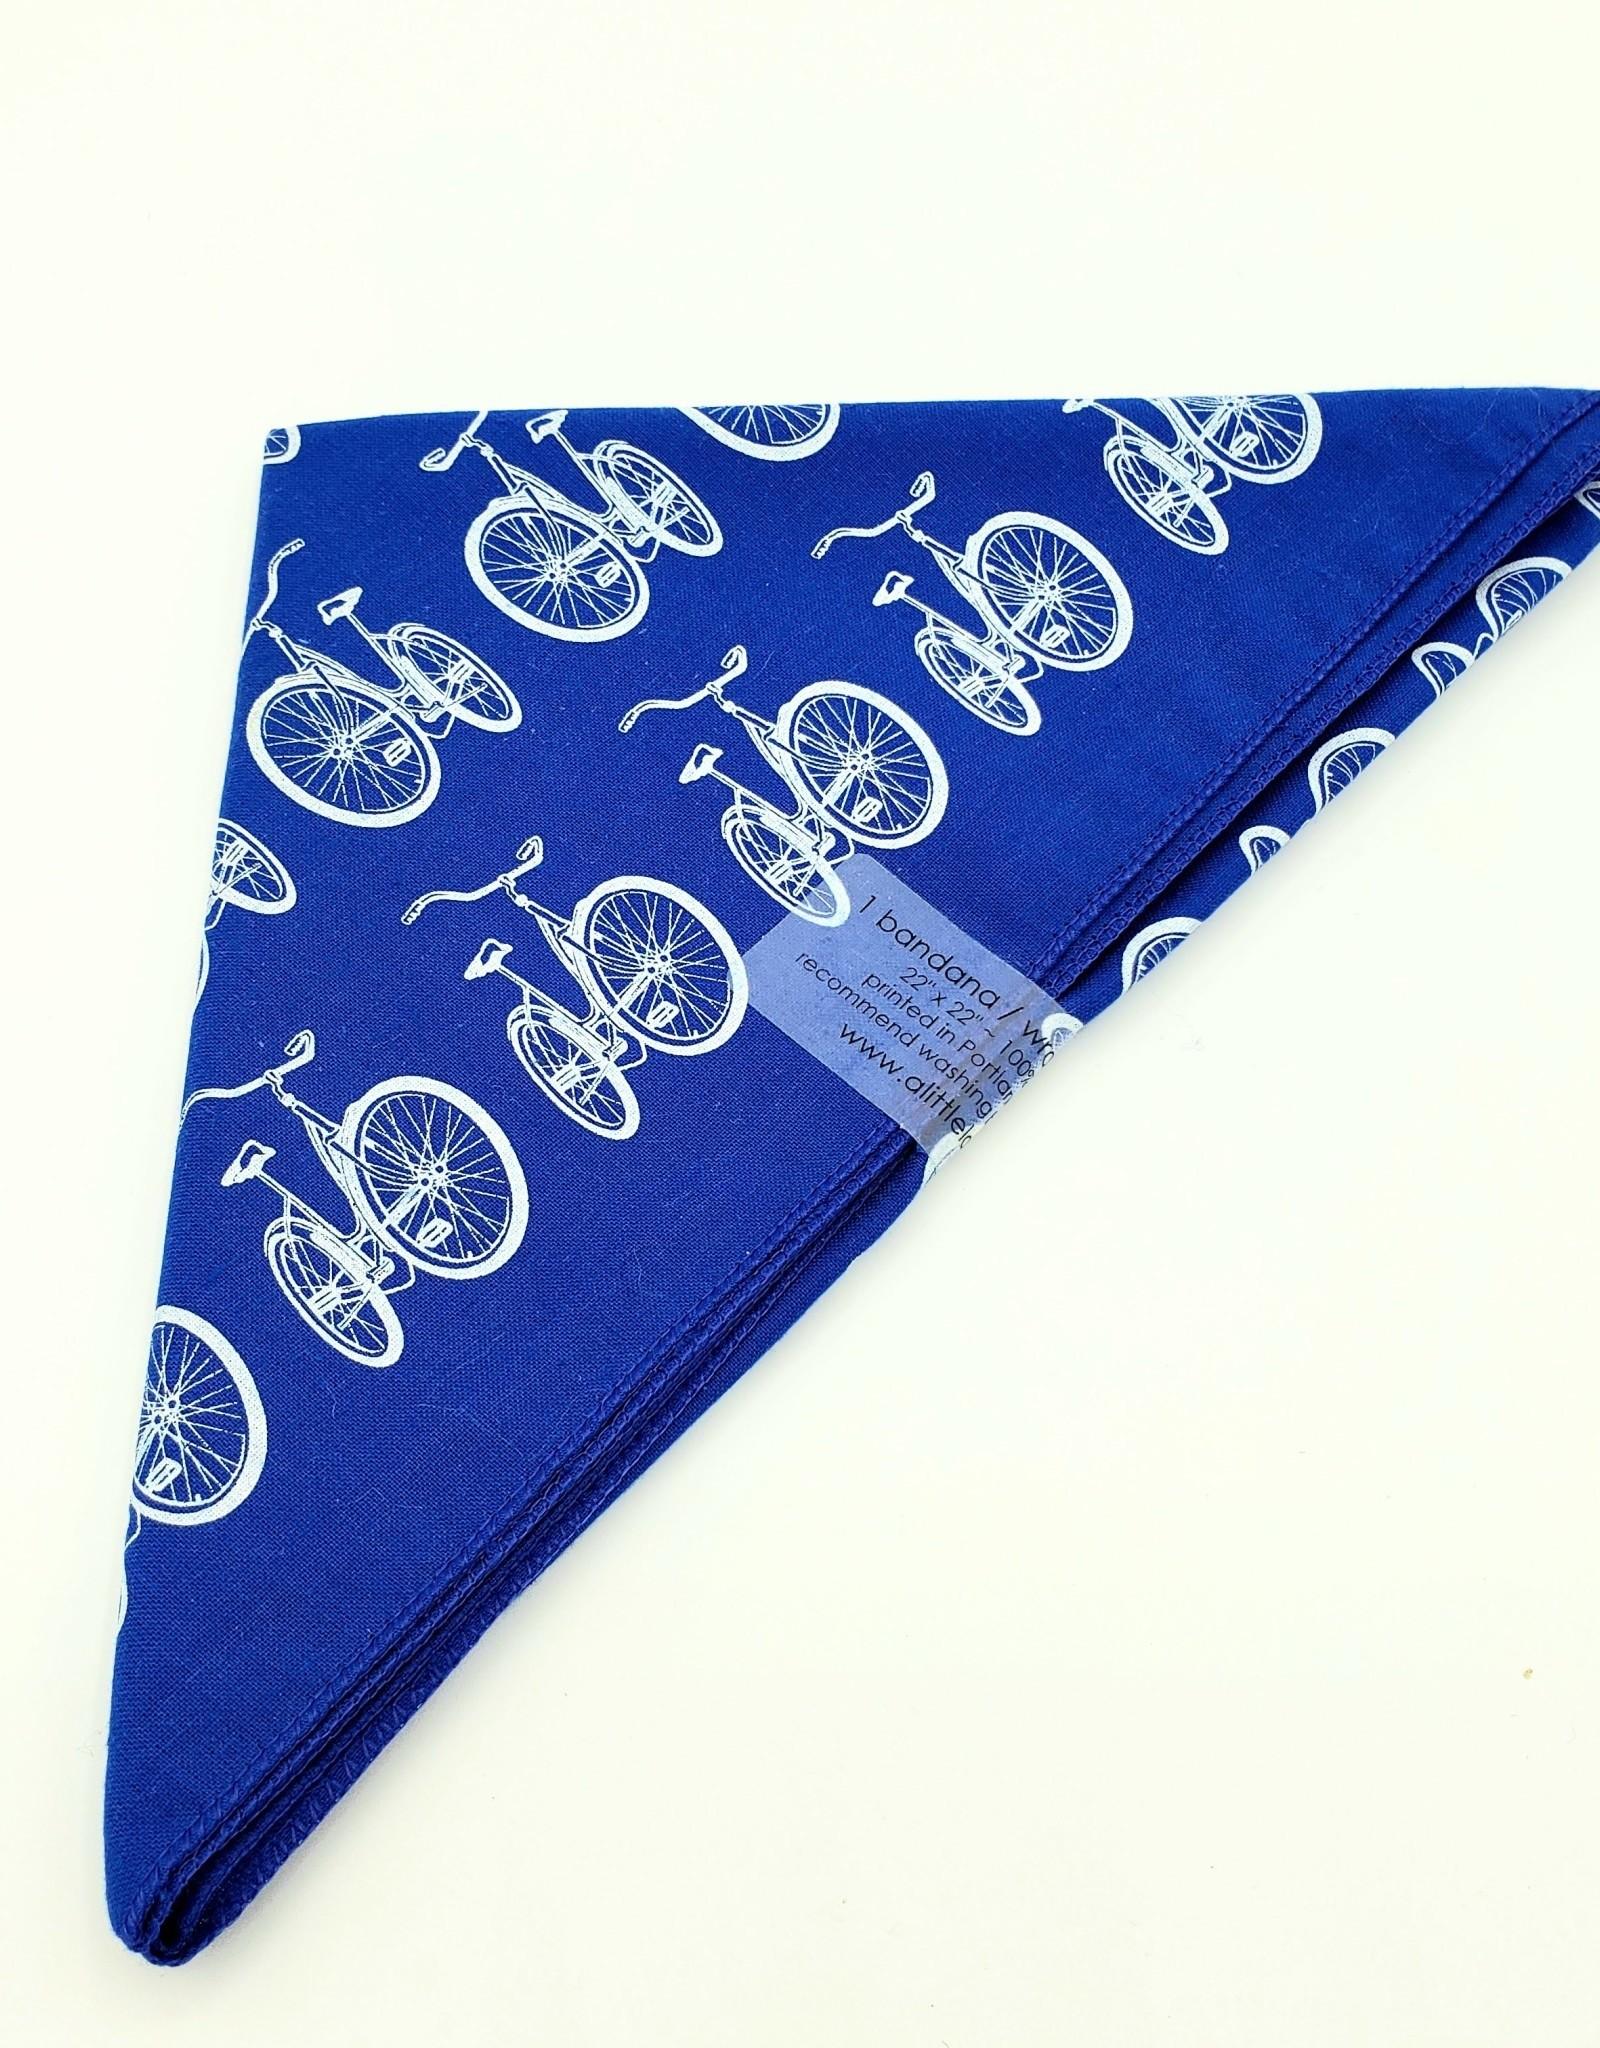 Bicycle Bandana in Blue by Little Lark